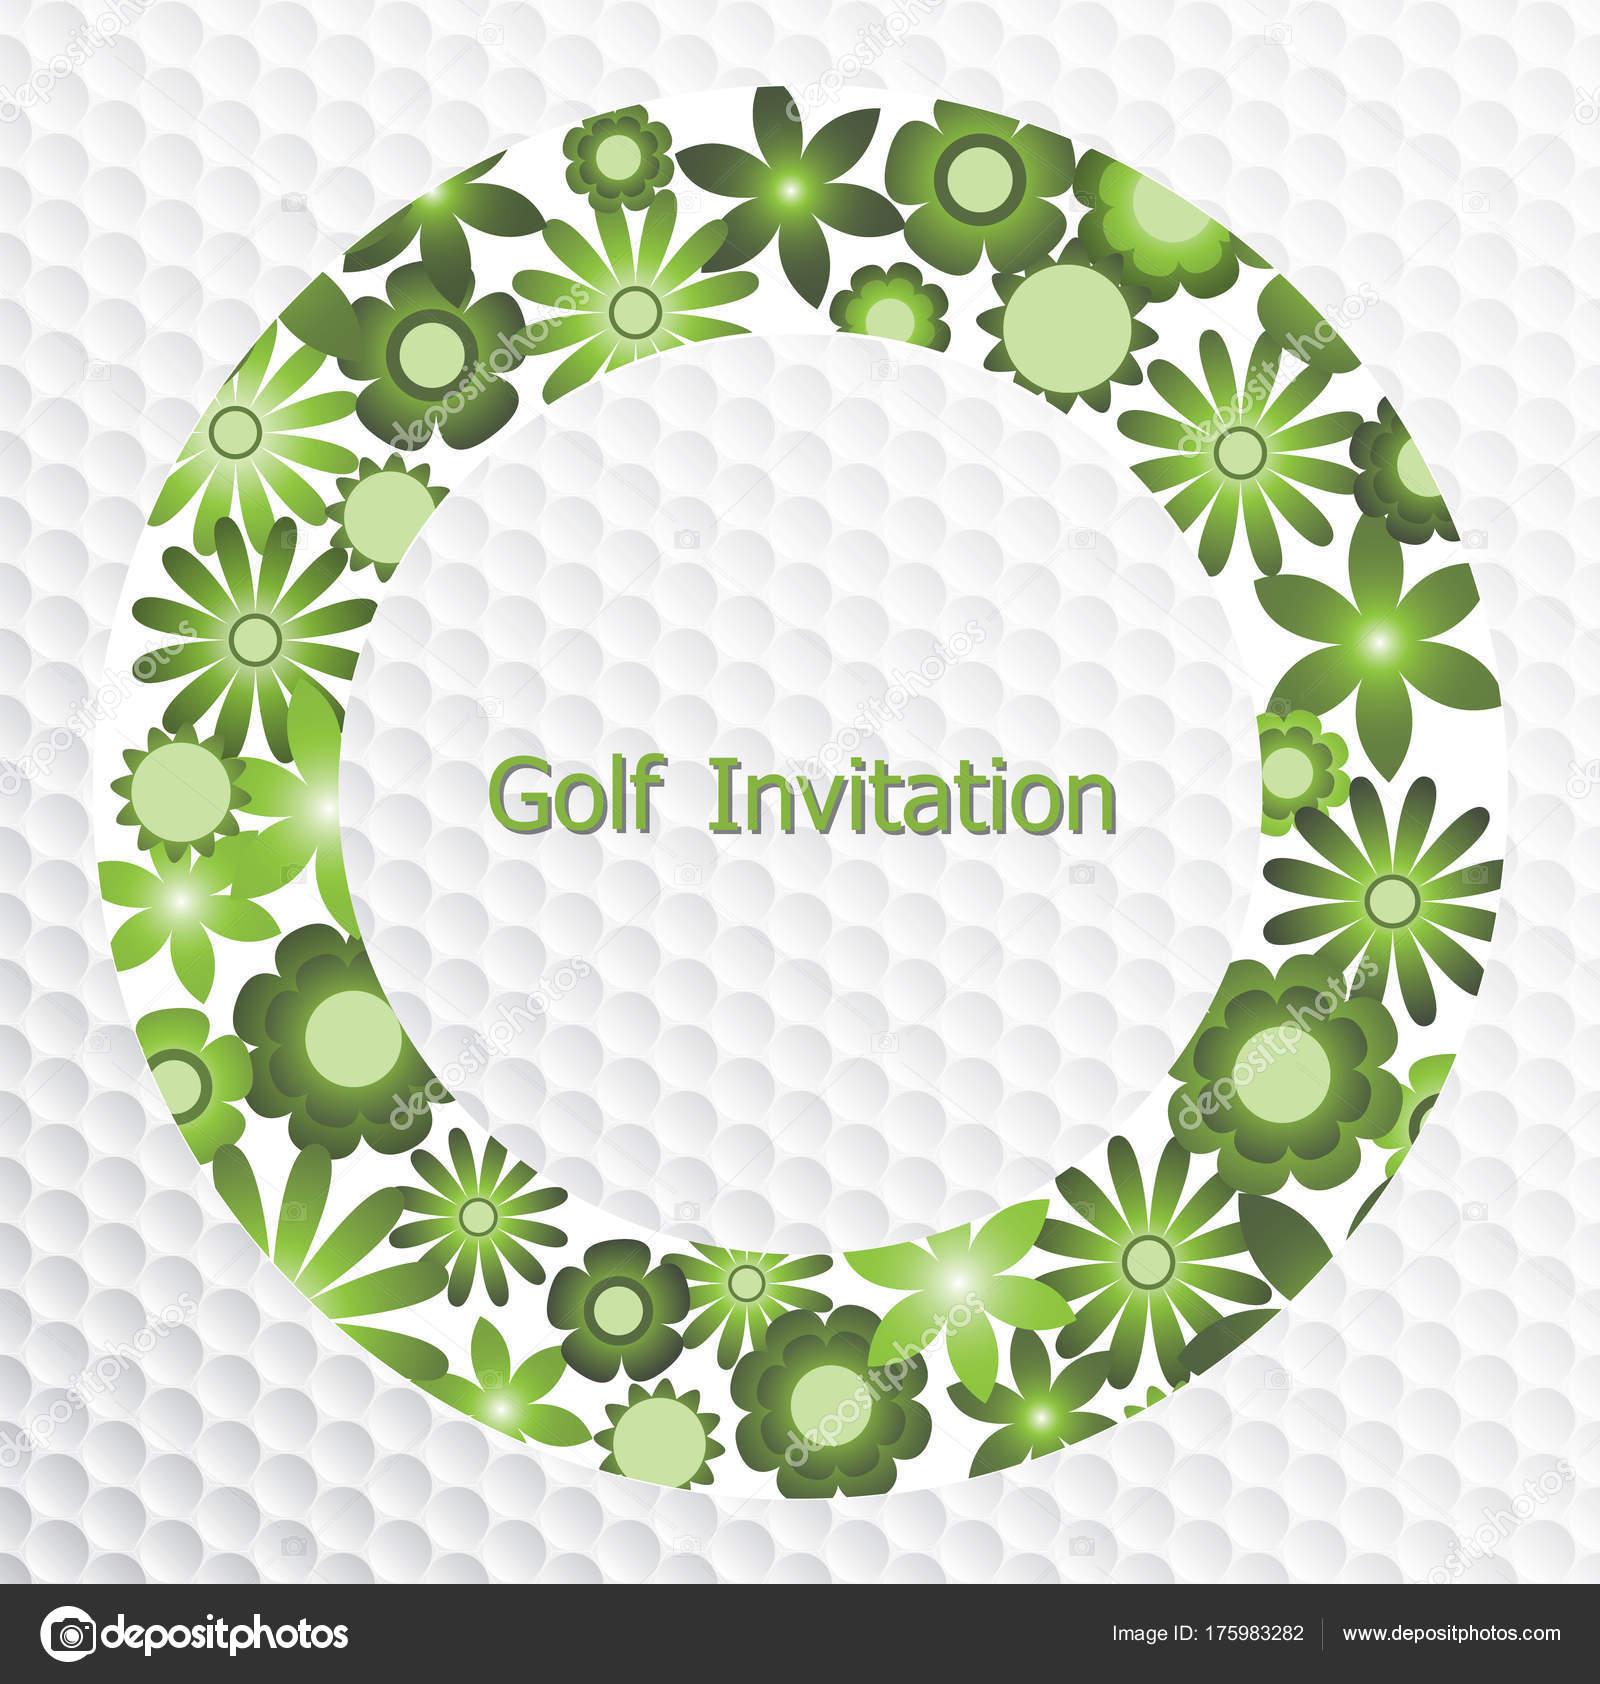 golf tournament invitation flyer template graphic design green